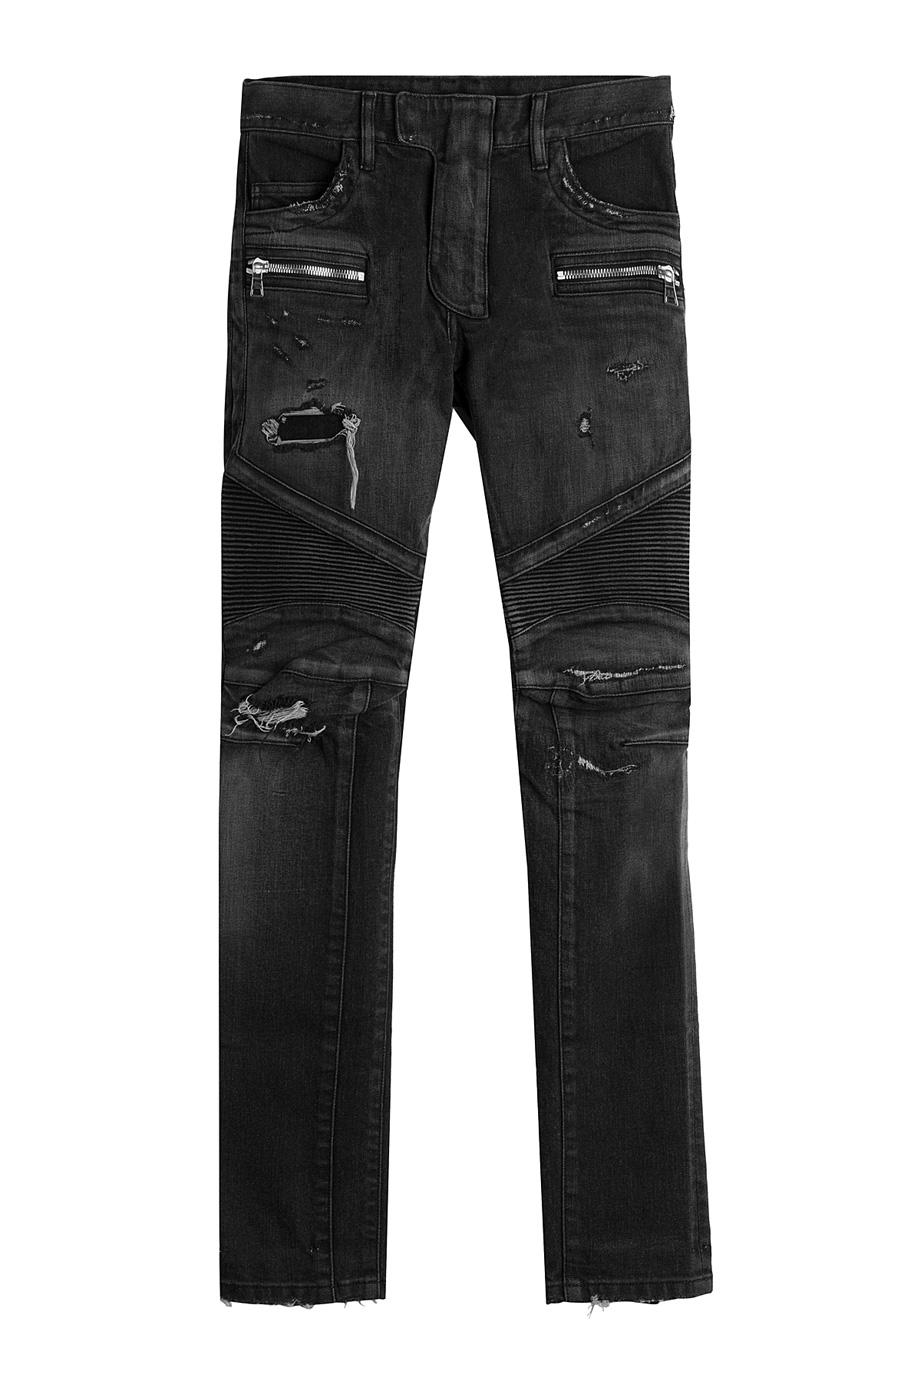 Balmain Slim Fit Distressed Denim Biker Jeans In Washed Black Modesens Ripped Faded